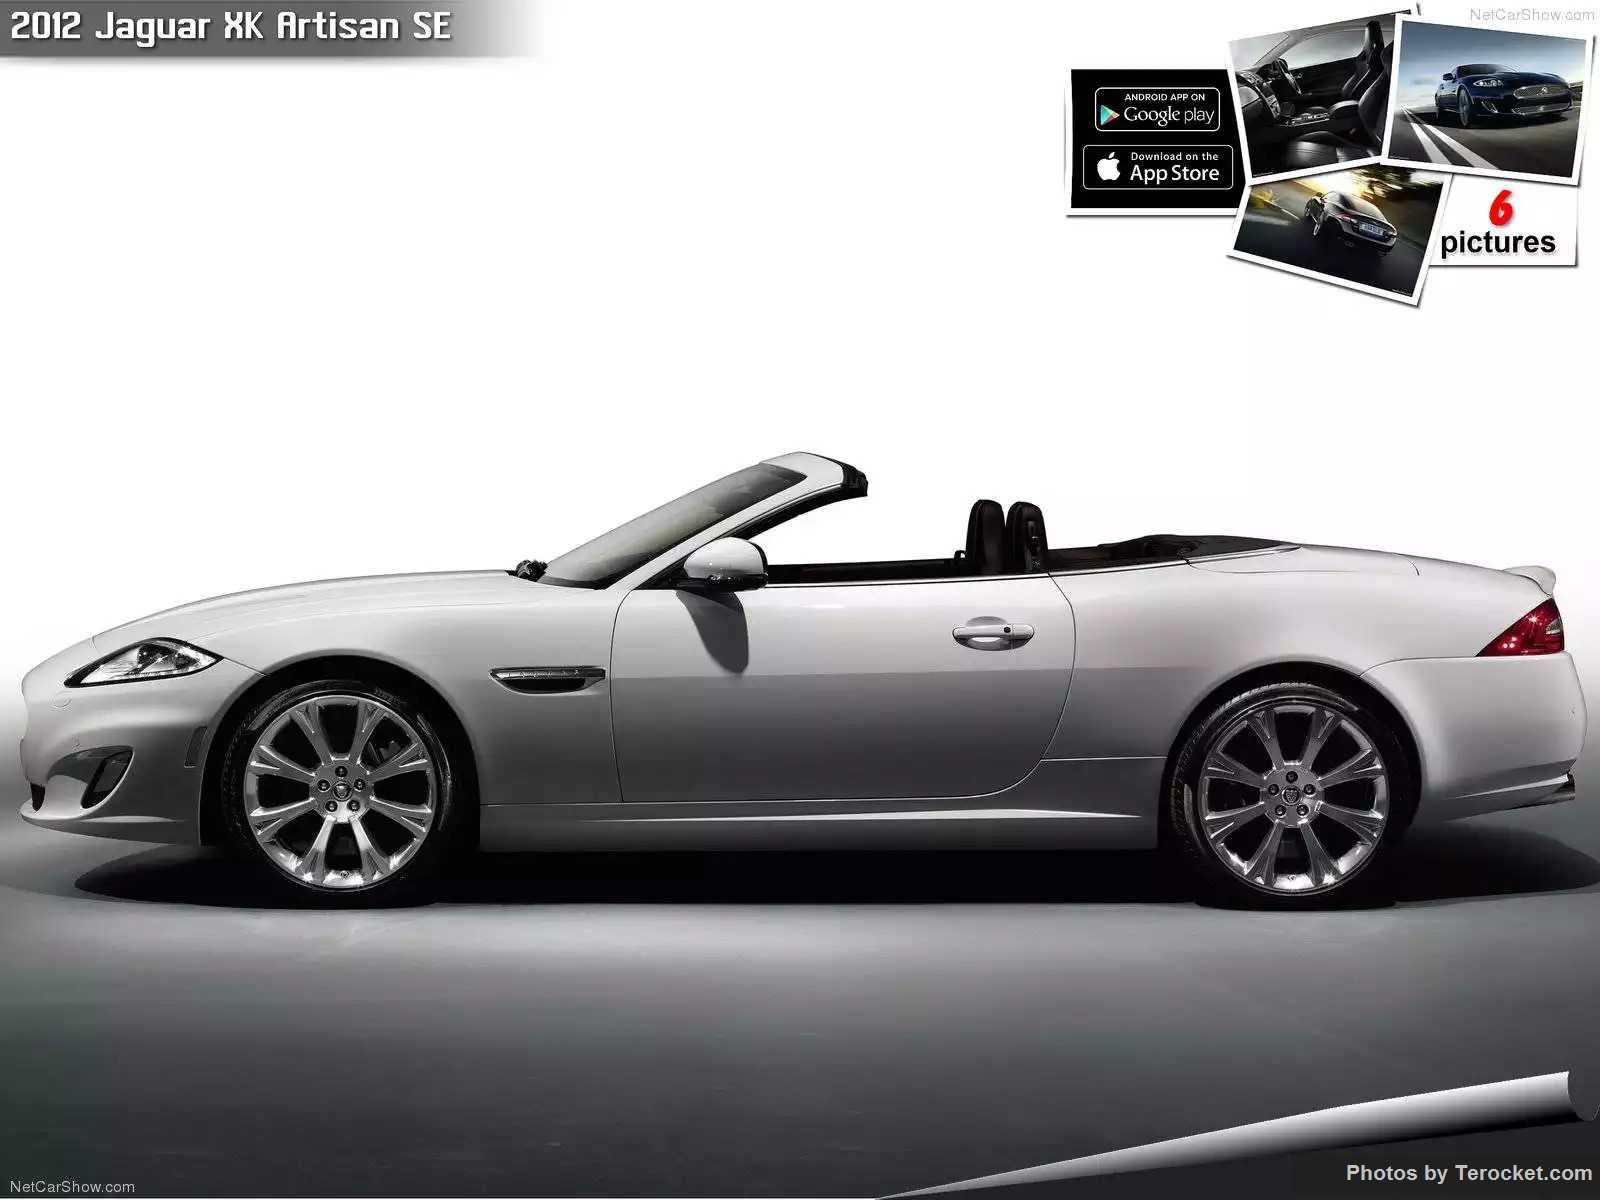 Hình ảnh xe ô tô Jaguar XK Artisan SE 2012 & nội ngoại thất